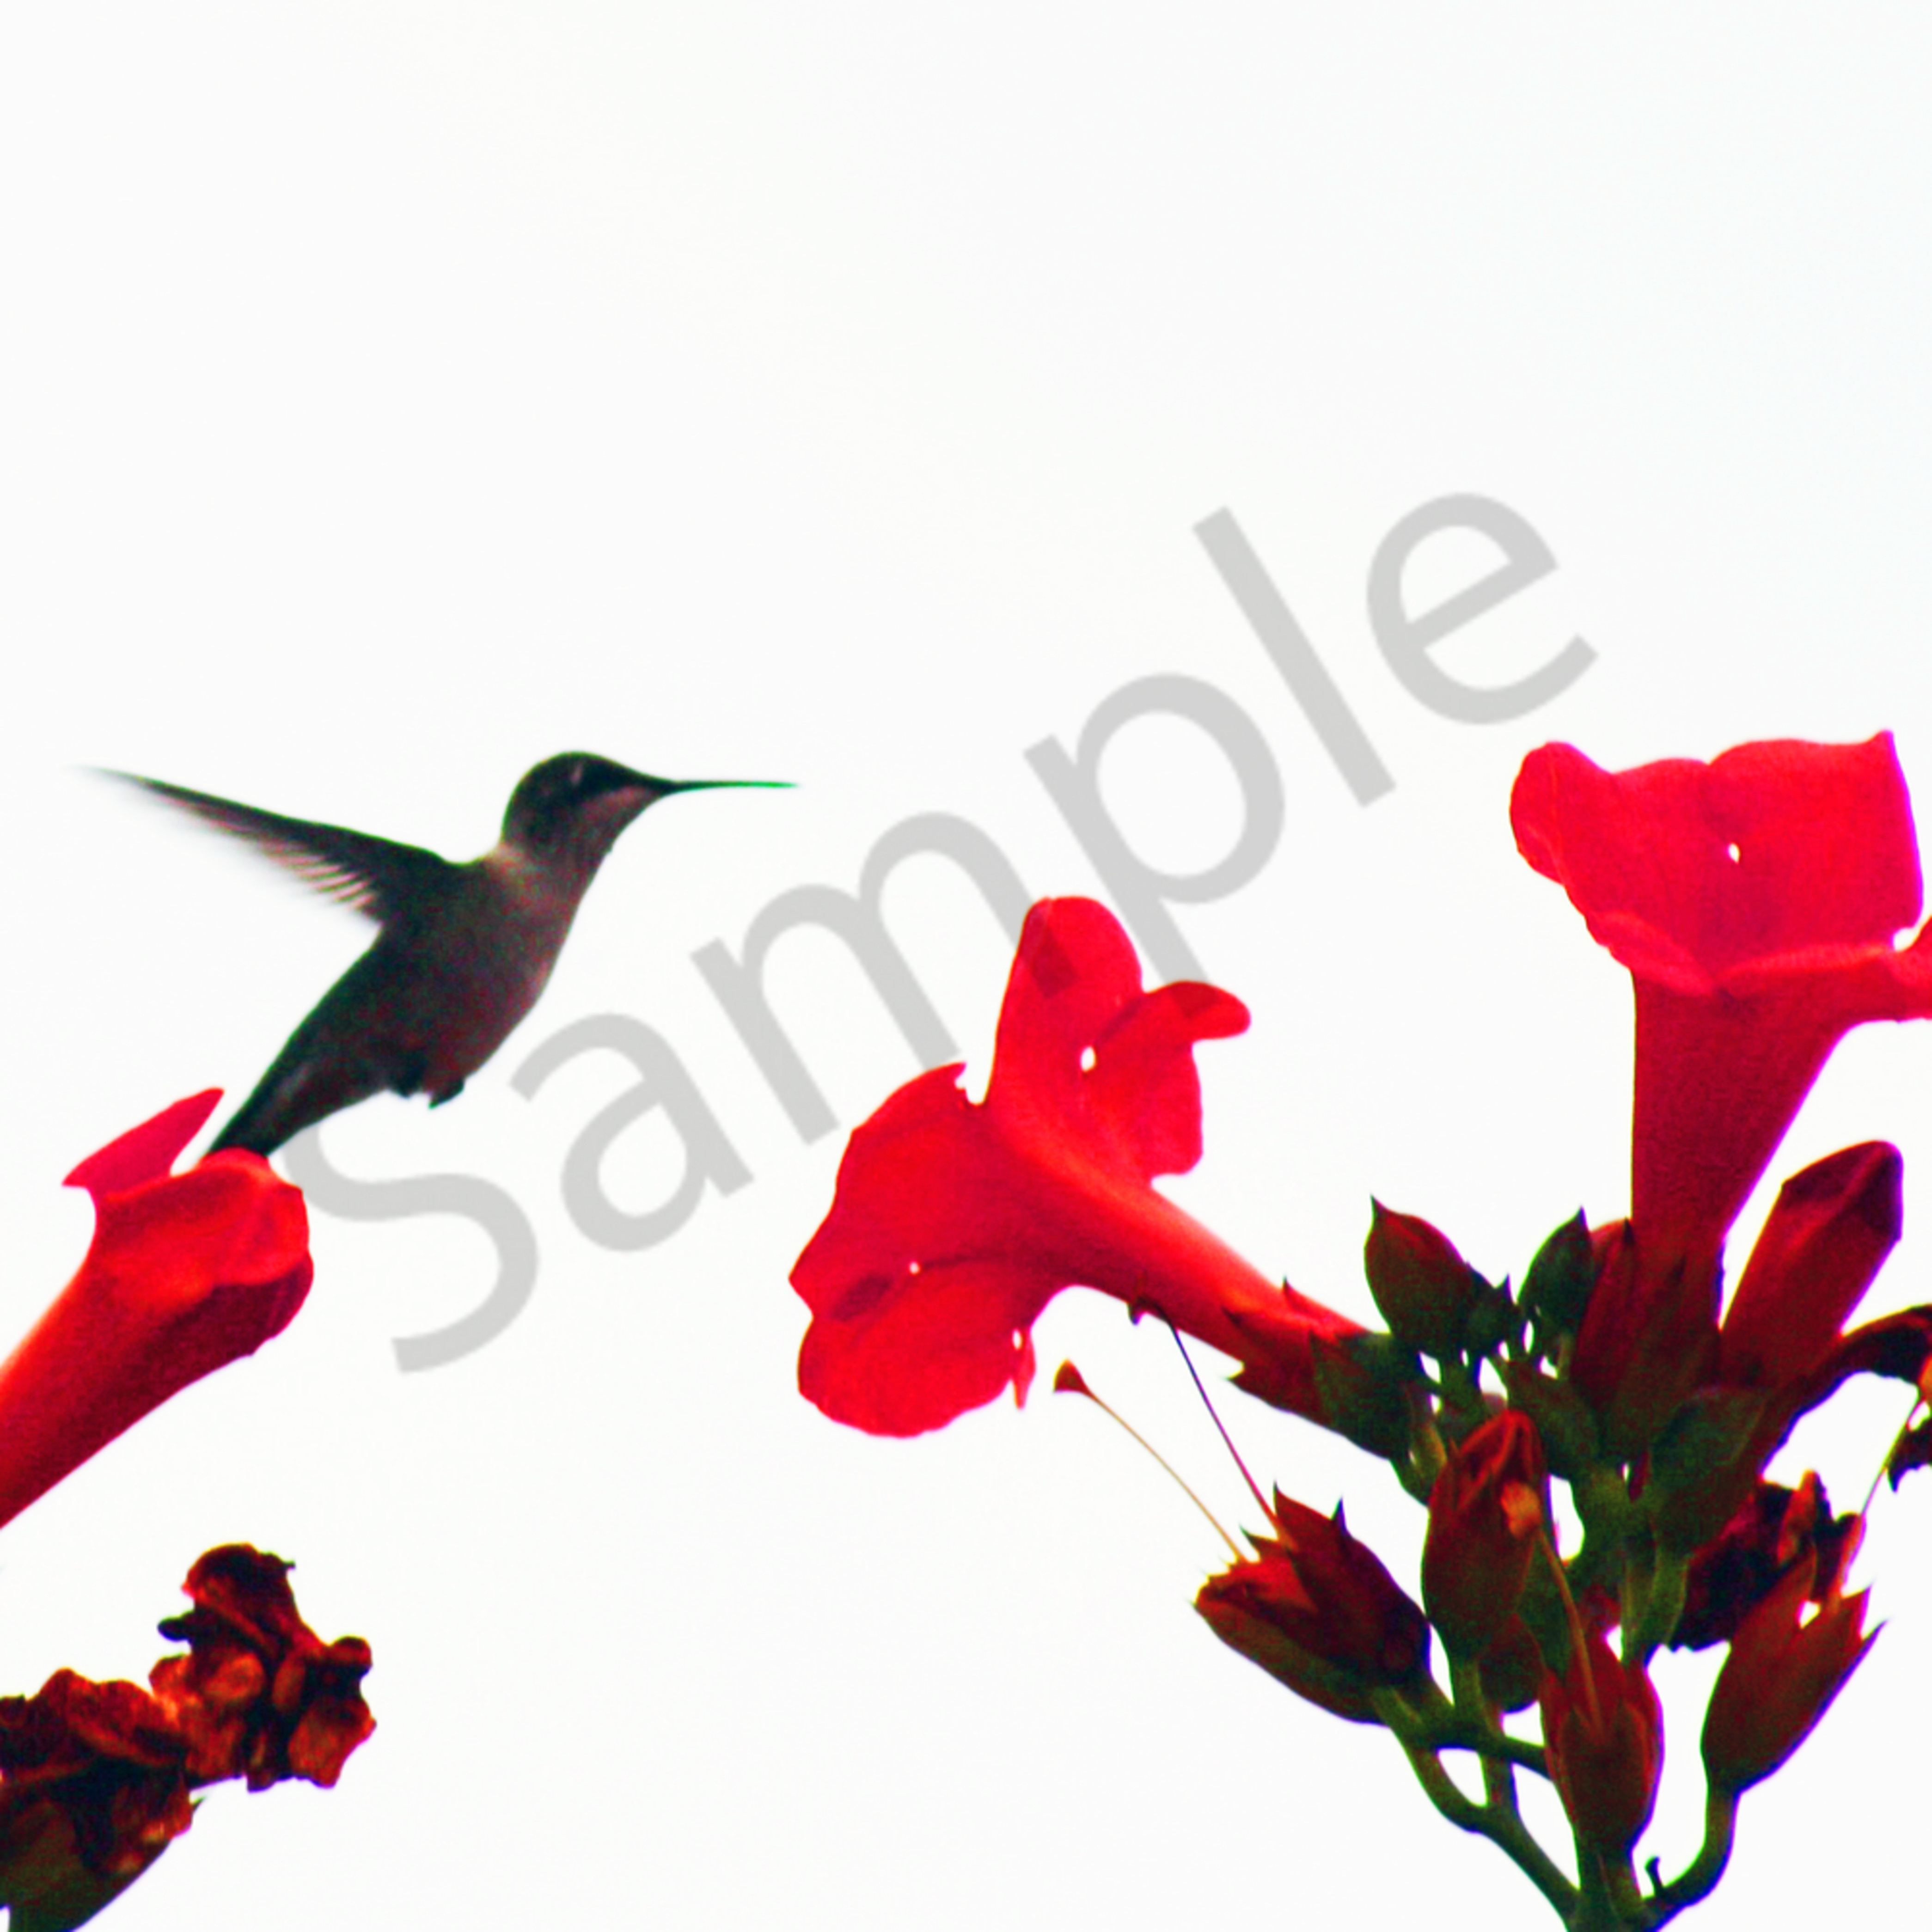 Hummingbirdresized2009 09 07 0016 jda9fl